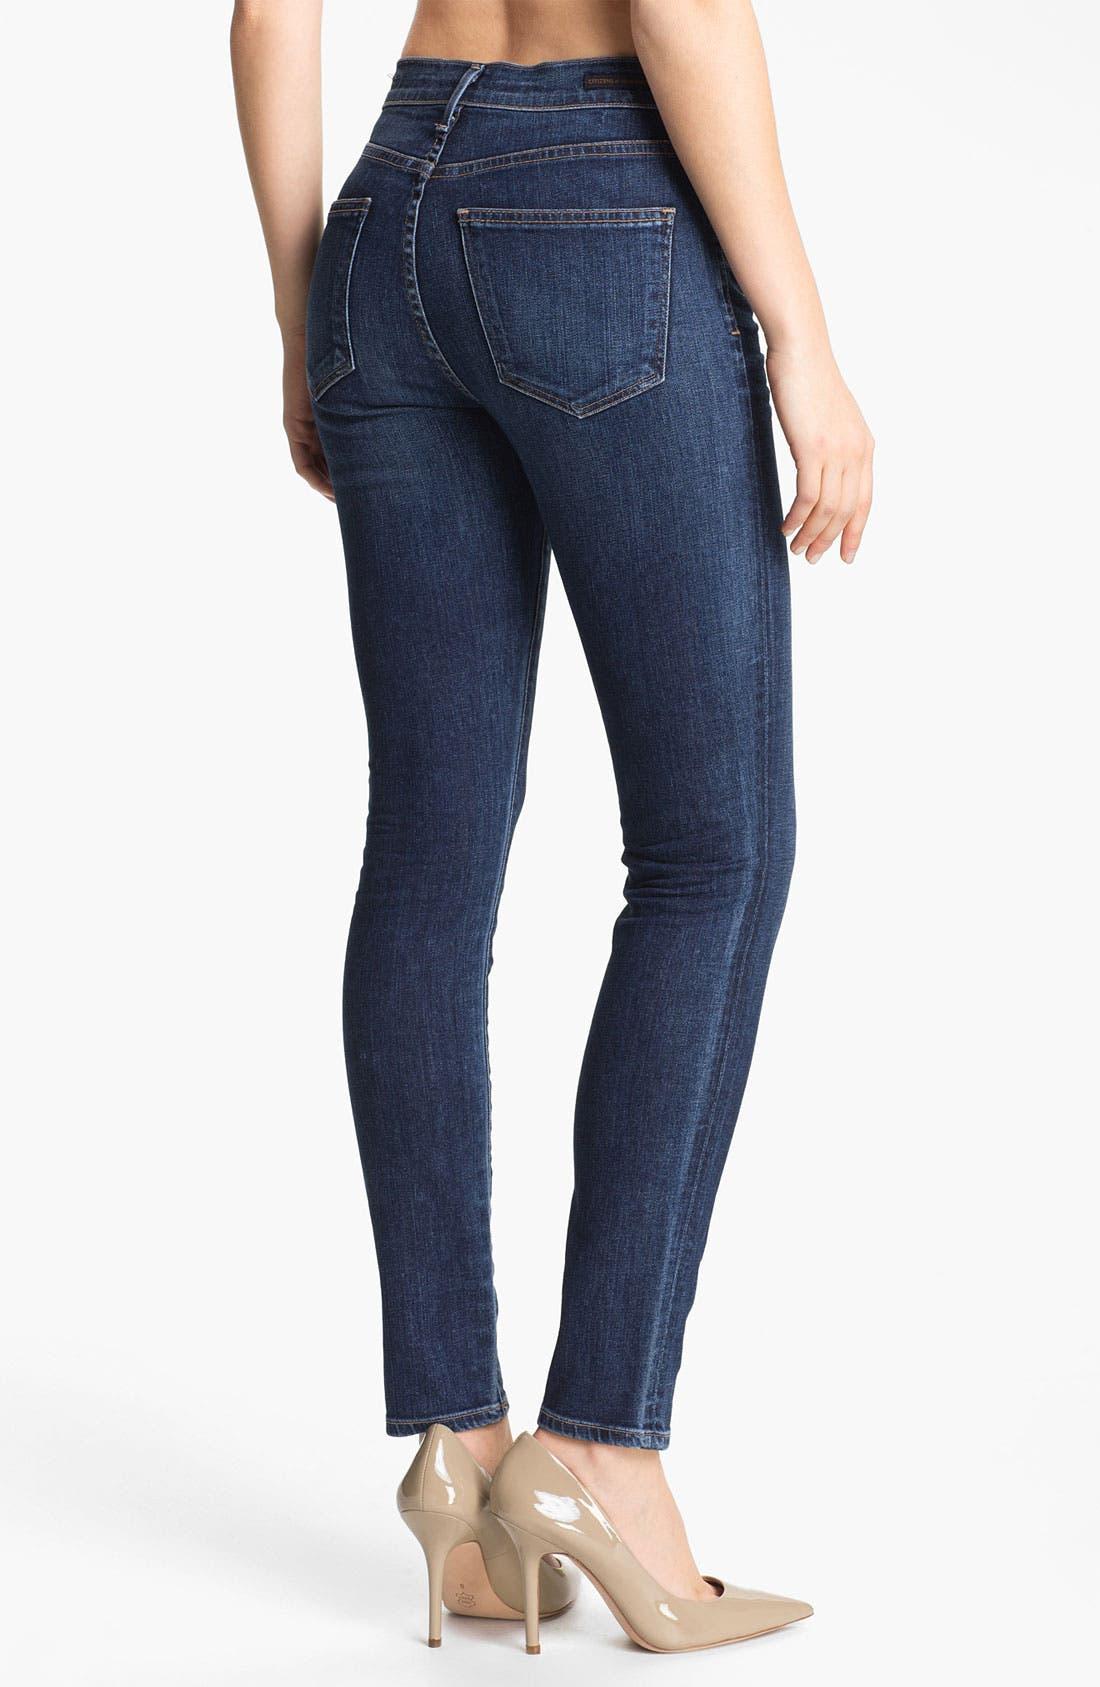 Alternate Image 2  - Citizens of Humanity 'Rocket' High Rise Skinny Jeans (Crispy)